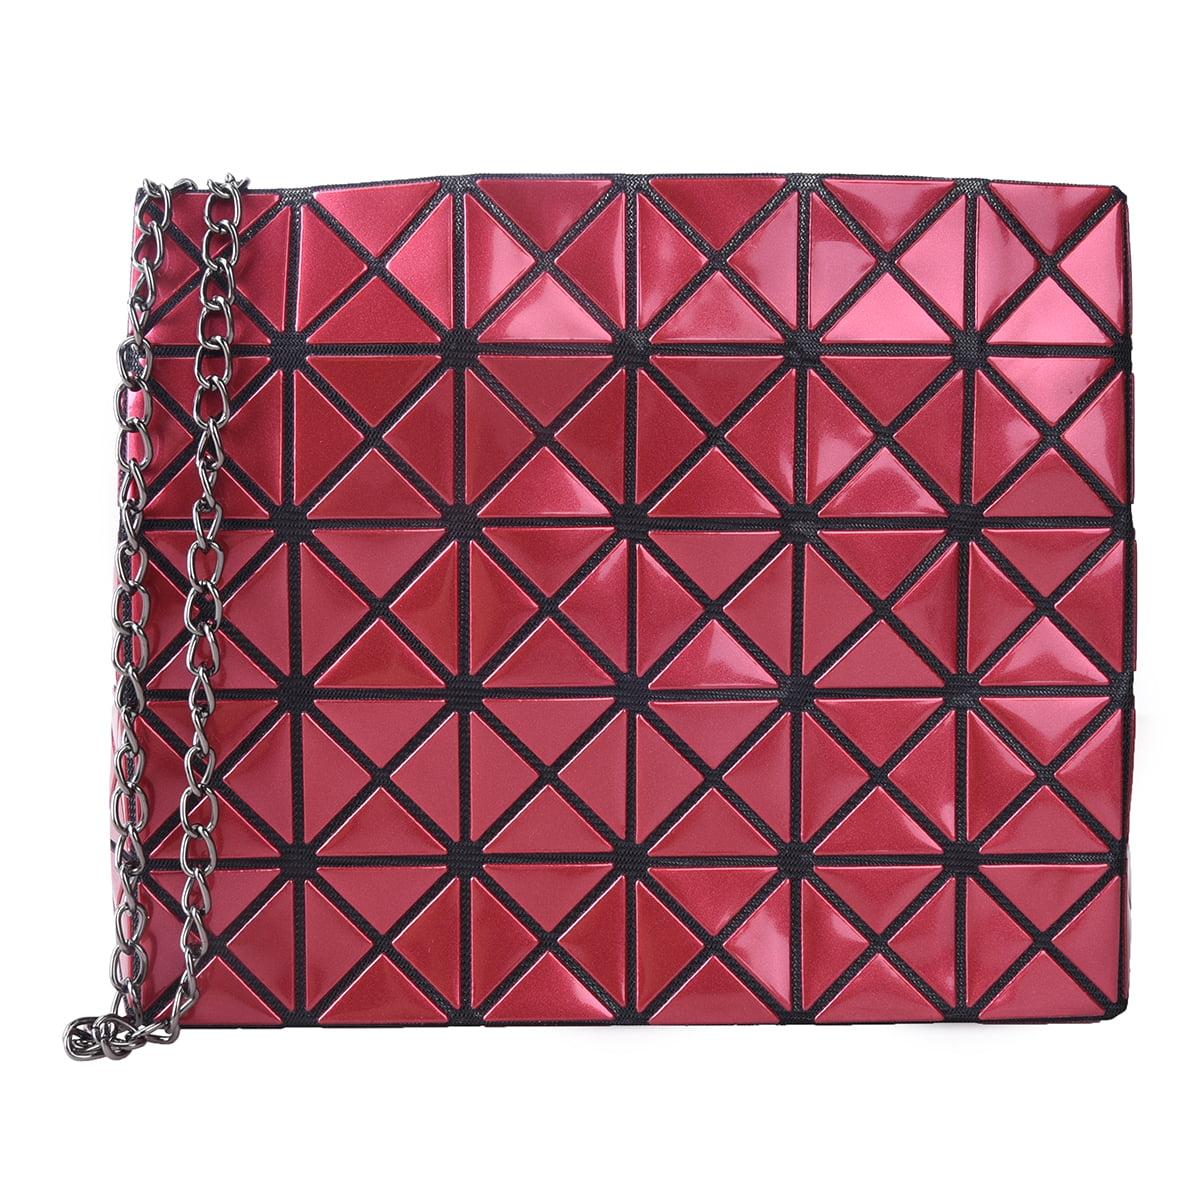 Women Shoulder Bags Geometric Totes Chains Strap Handbags Party Purse Clutch Bag